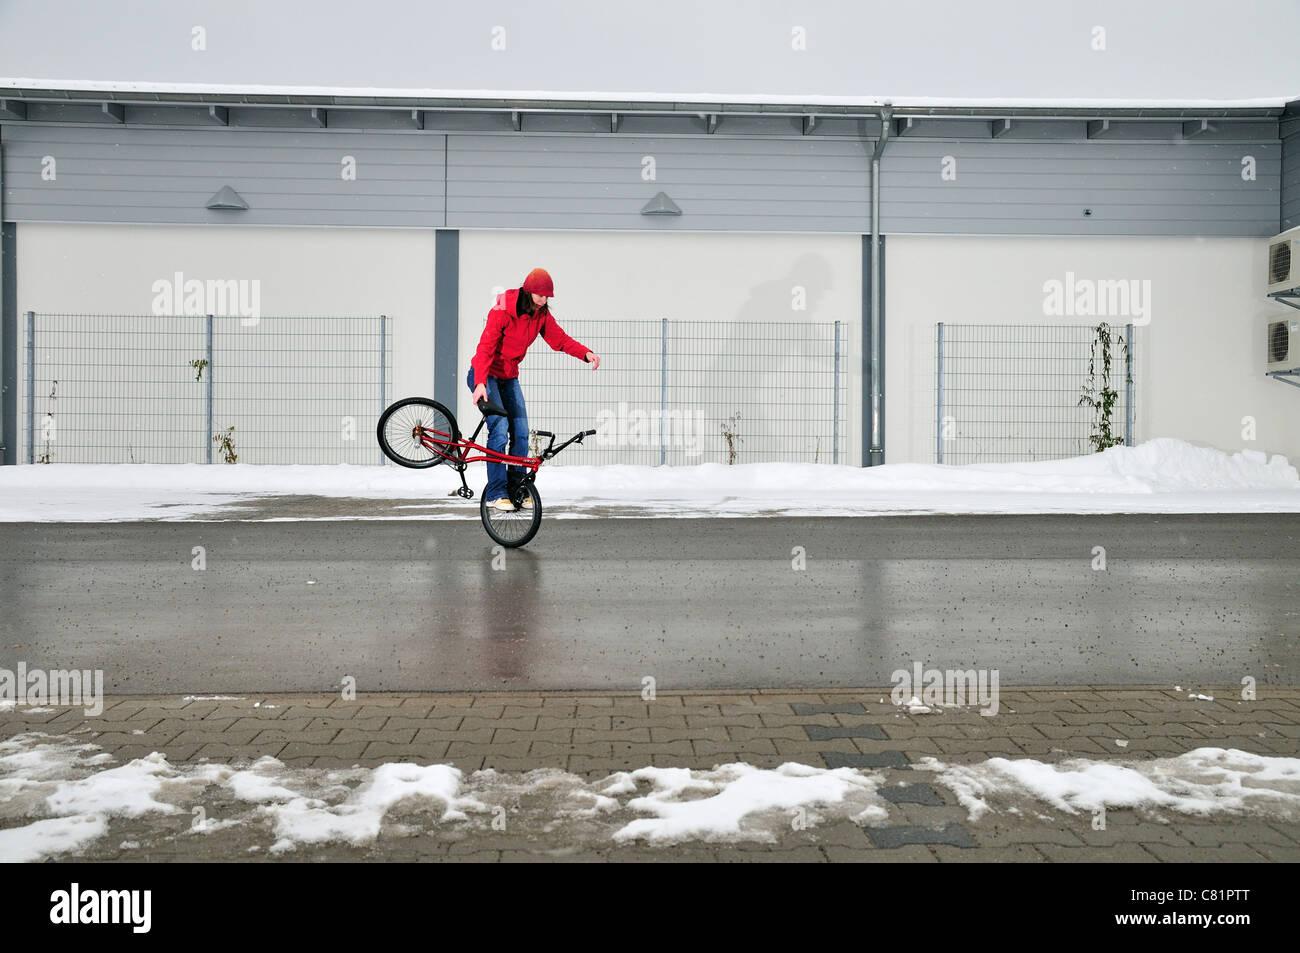 BMX Flatland rider Monika Hinz, riding her bike in winter, Baden-Wuerttemberg, Germany - Stock Image